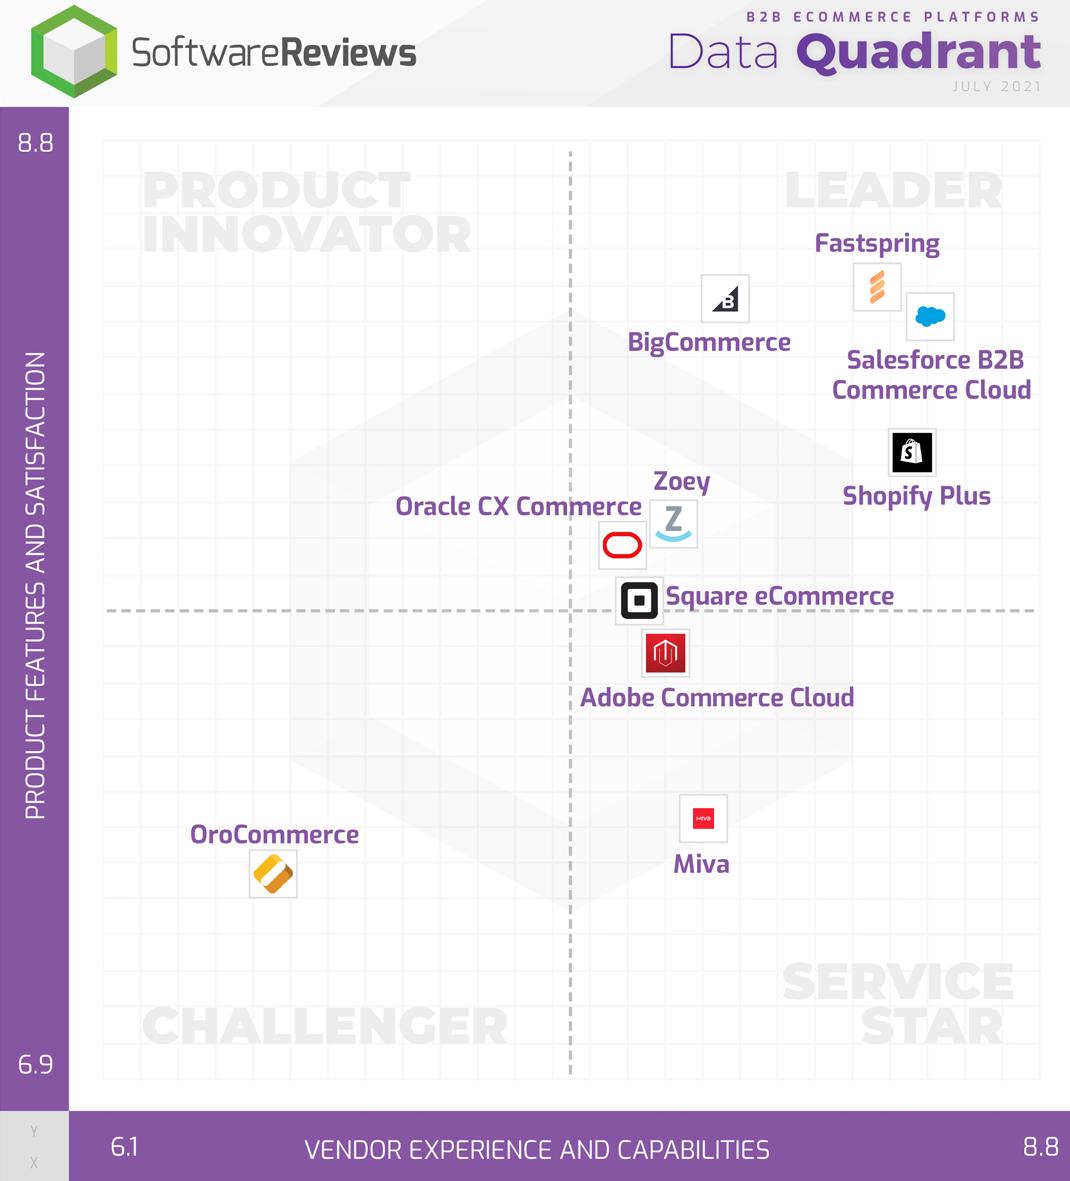 B2B eCommerce Platforms Data Quadrant